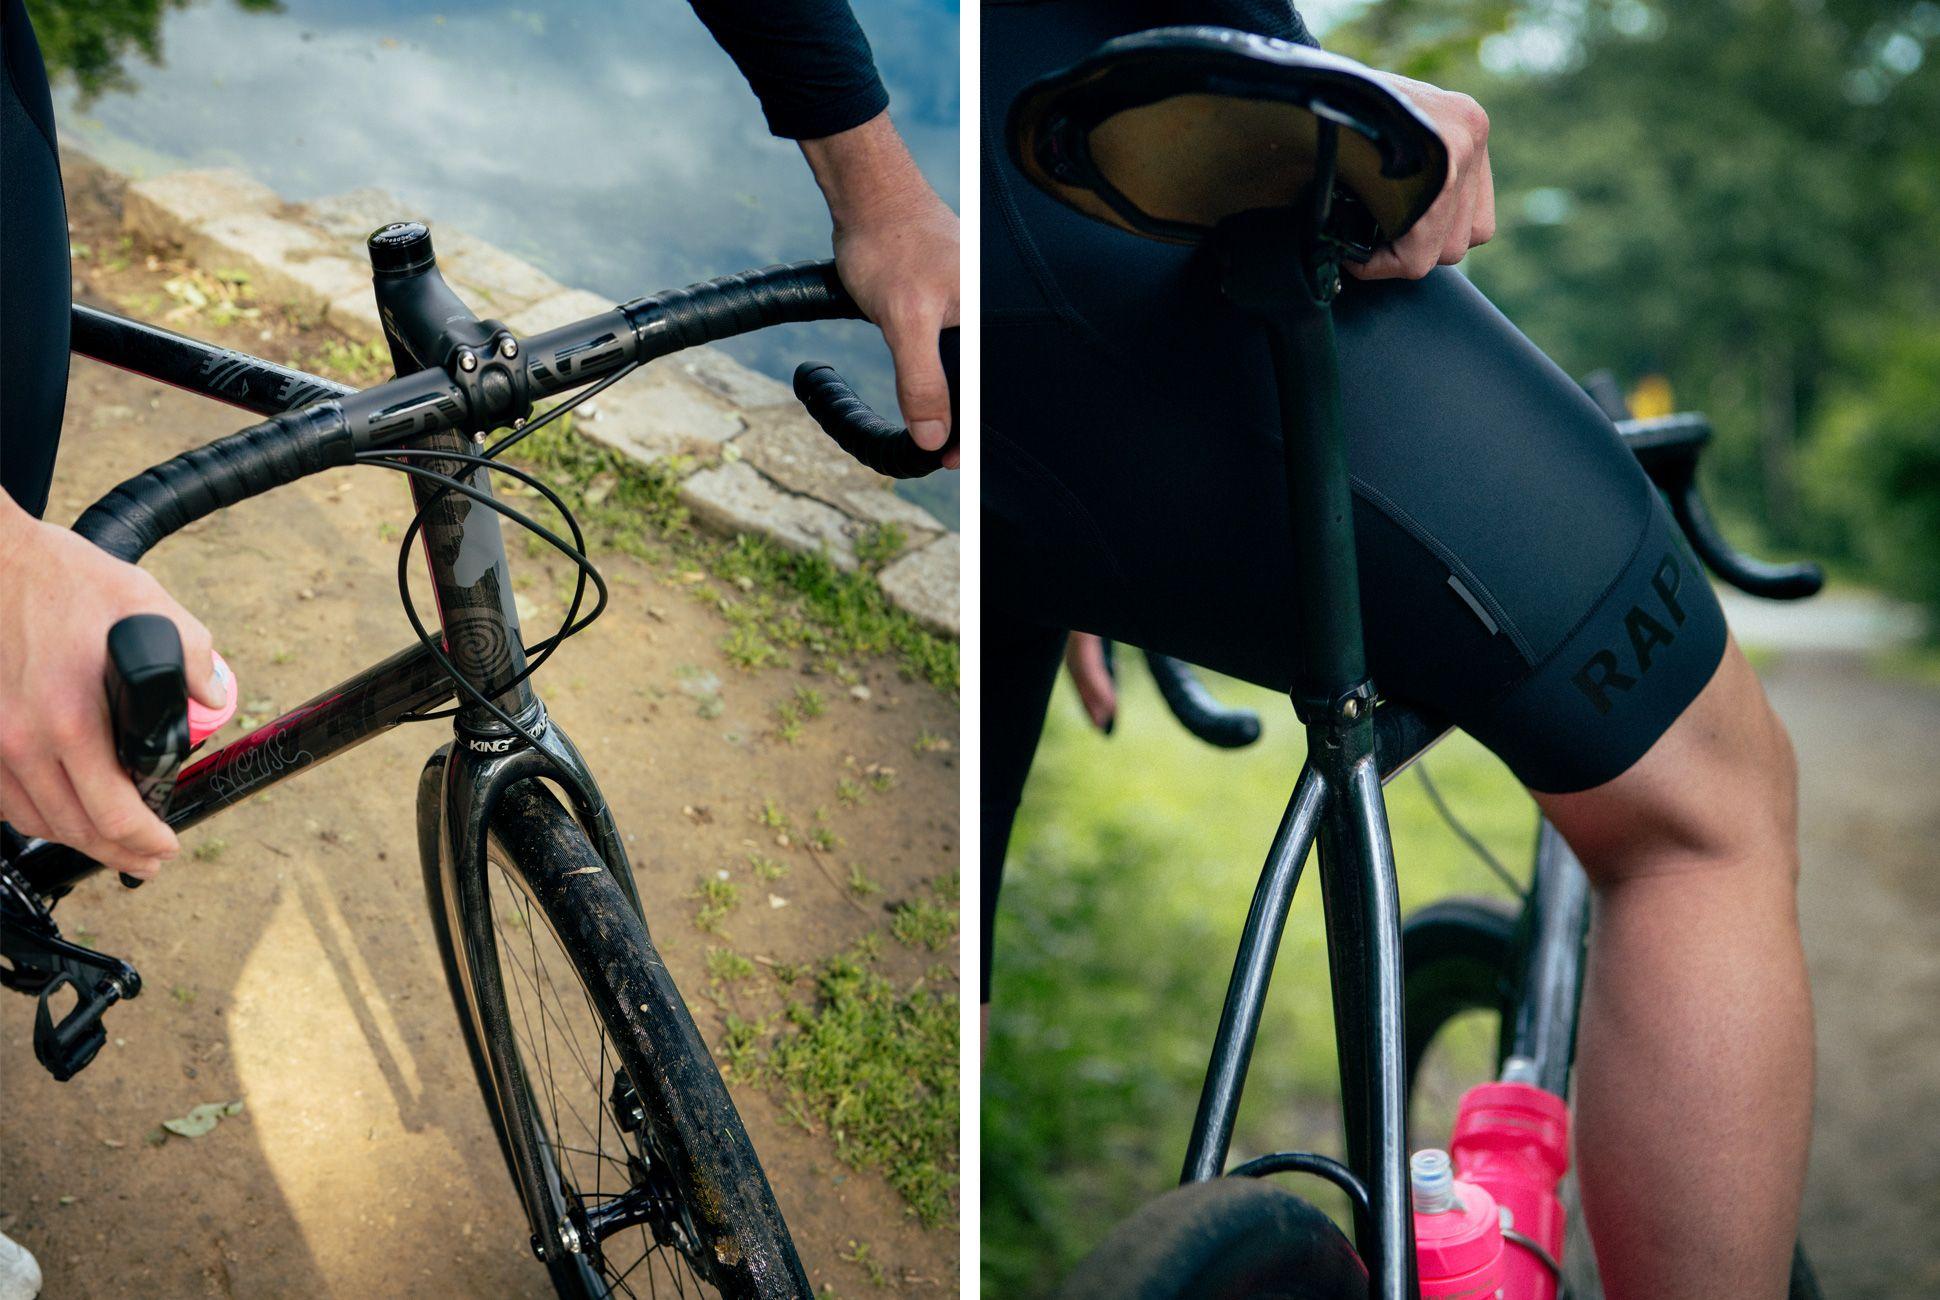 custom-american-bike-gear-patrol-build-slide-5